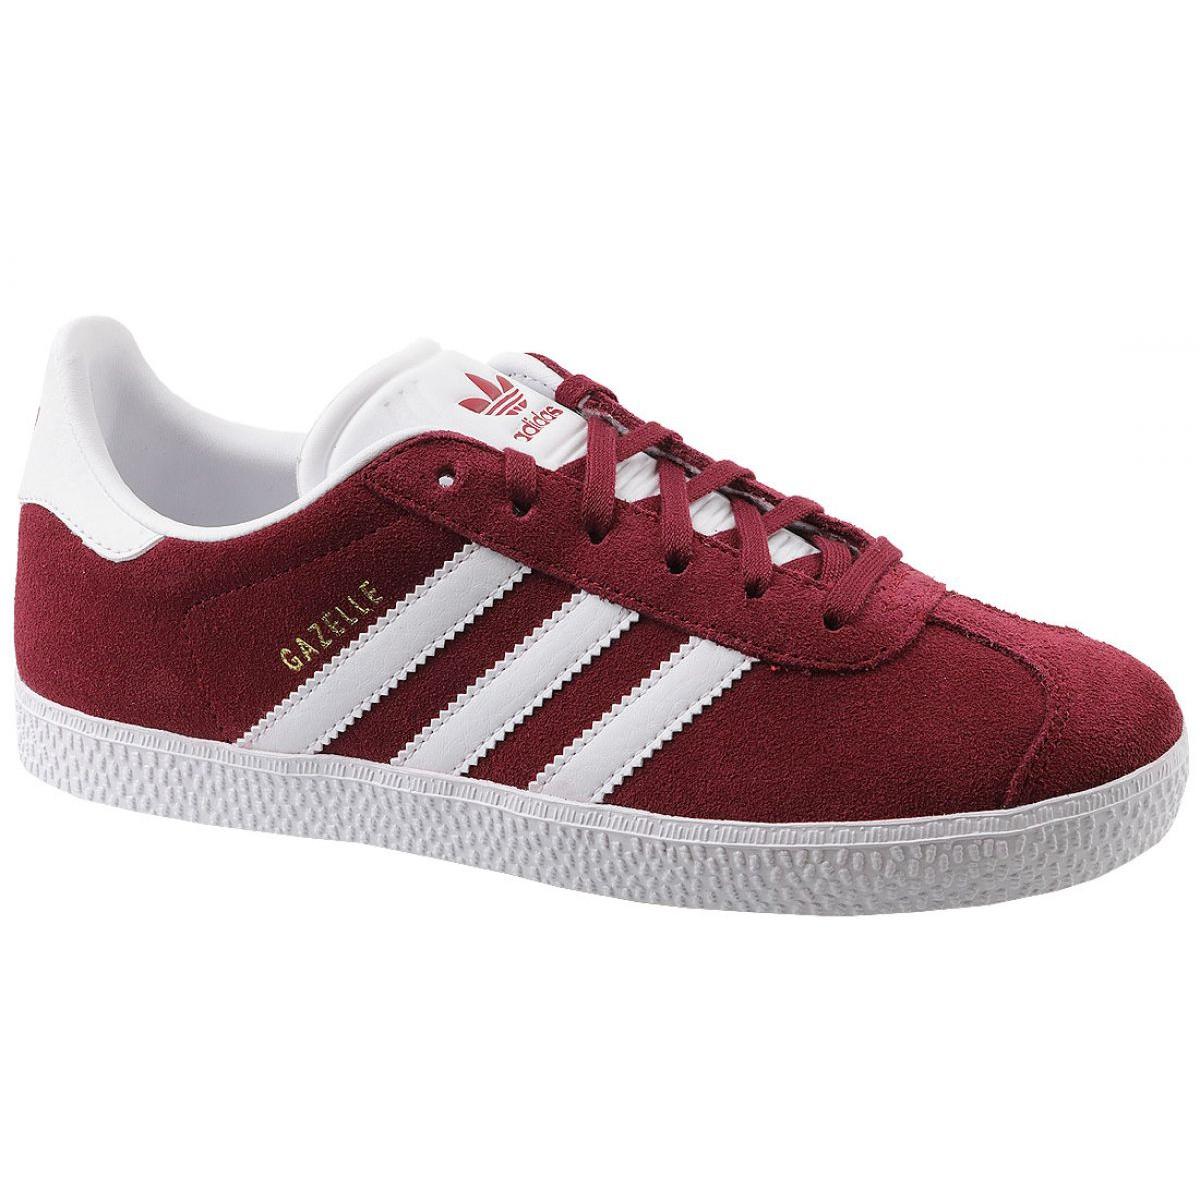 Adidas Gazelle Jr CQ2874 red shoes white